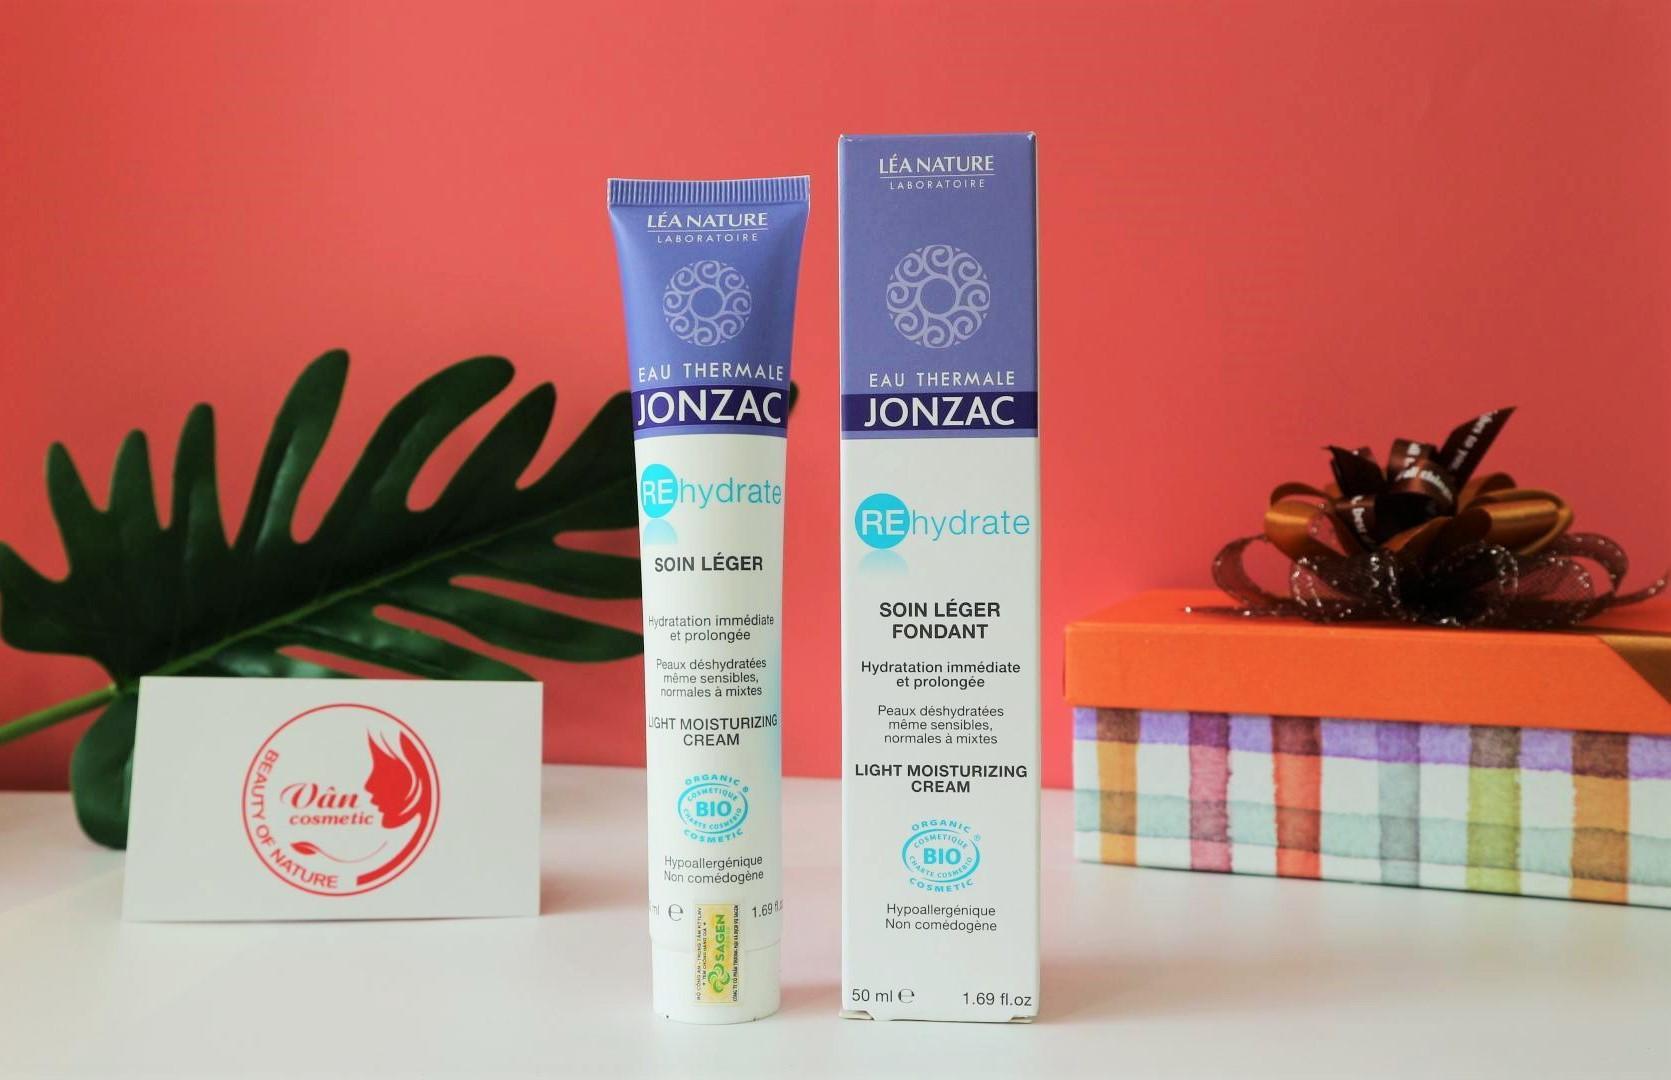 Kem Dưỡng Cấp Nước Eau Thermale Jonzac Rehydrate Light Moisturizing Cream